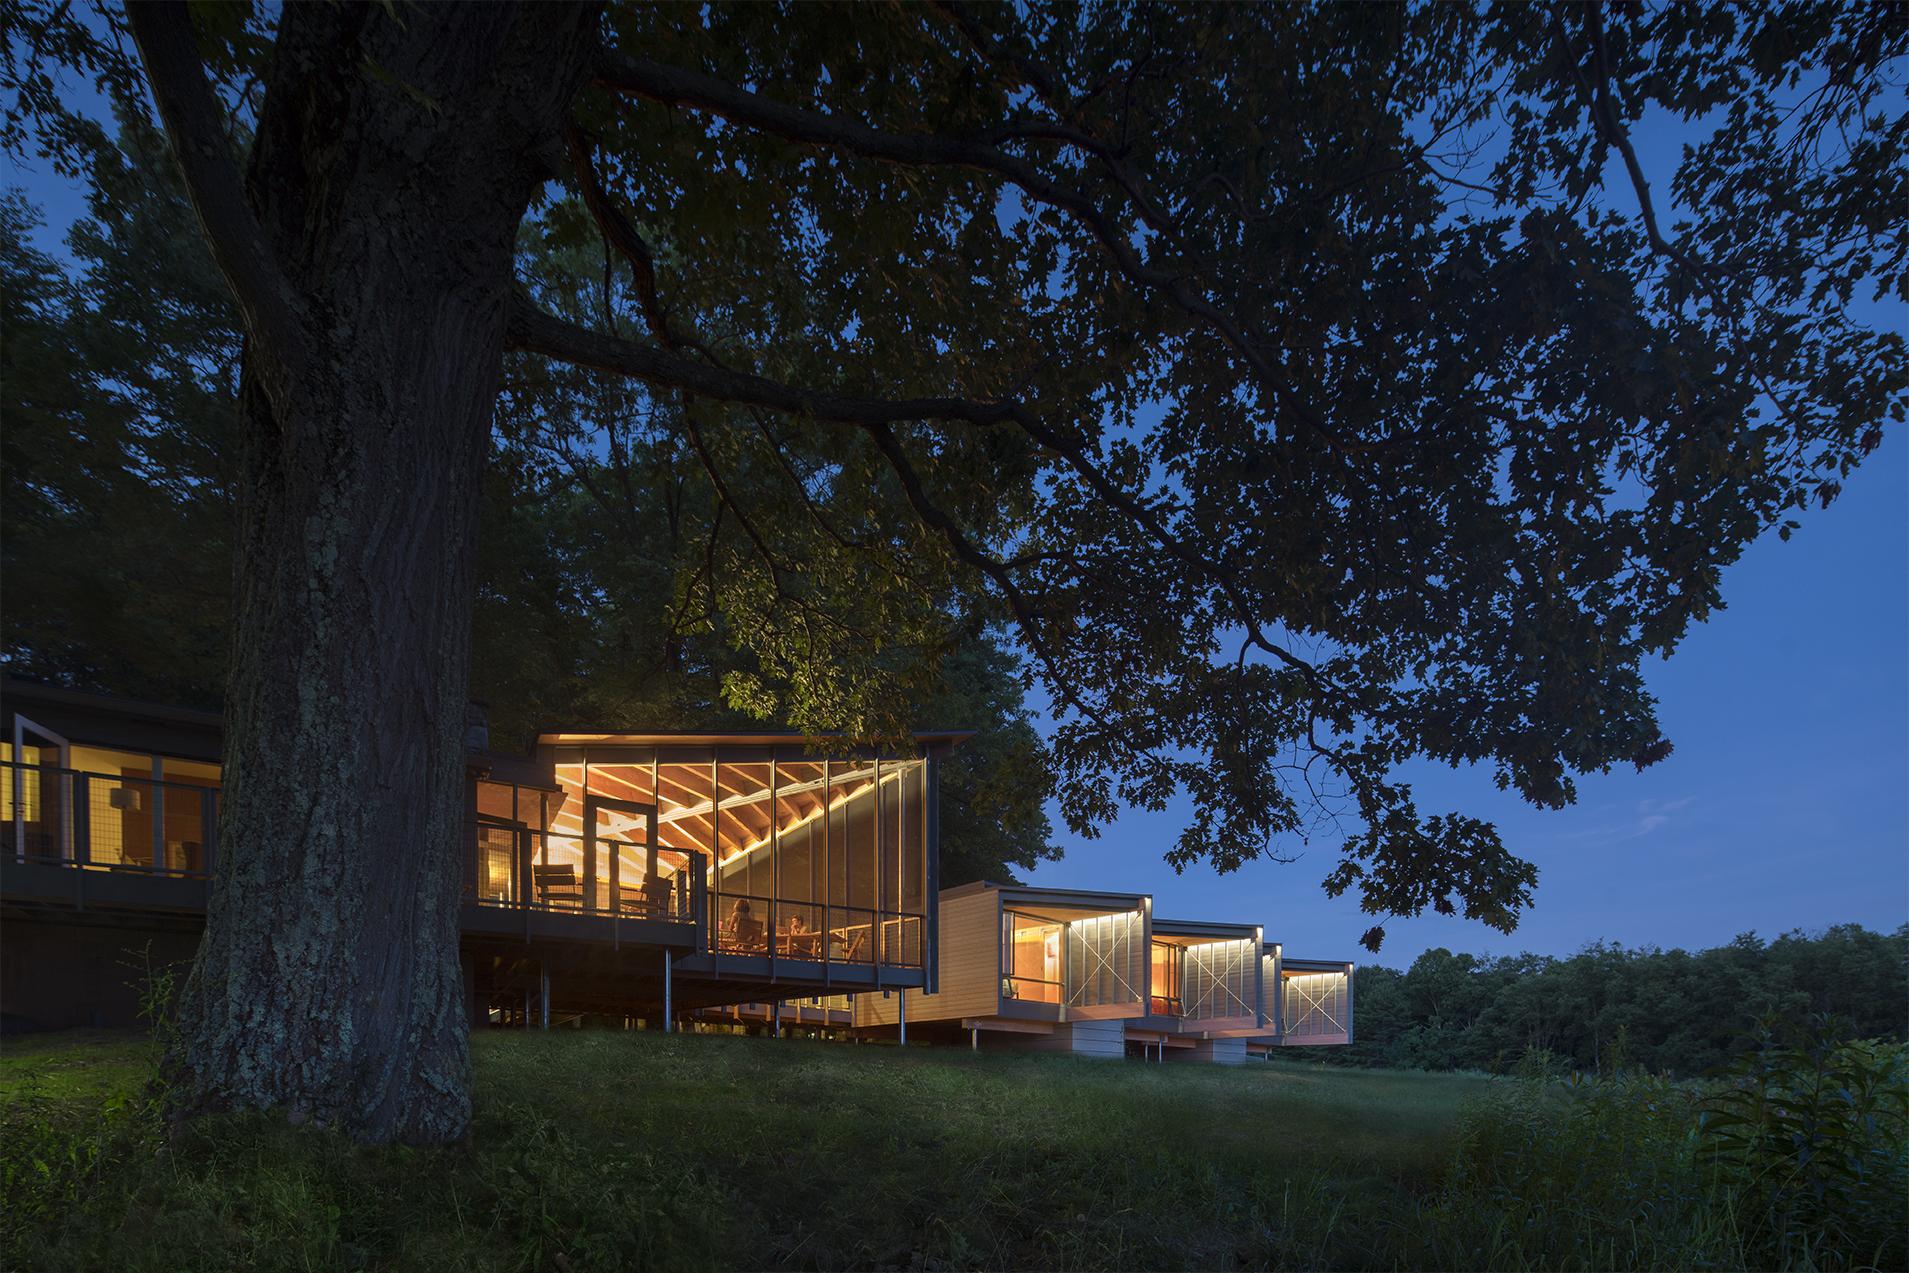 Frank Lloyd Wright's Fallingwater Institute gets sleek expansion